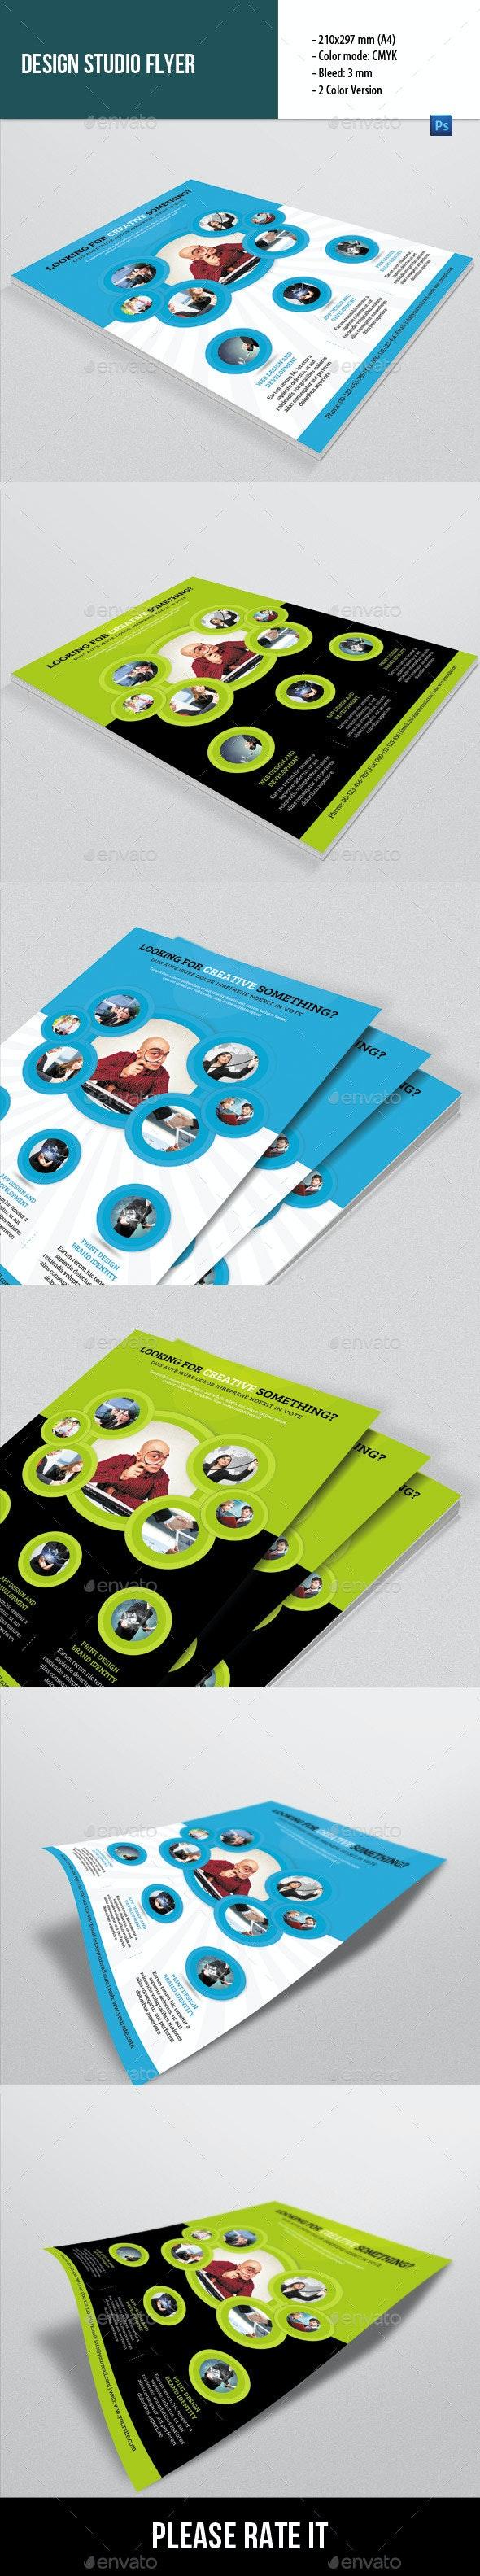 Flyer Template for Design Studio - Corporate Flyers